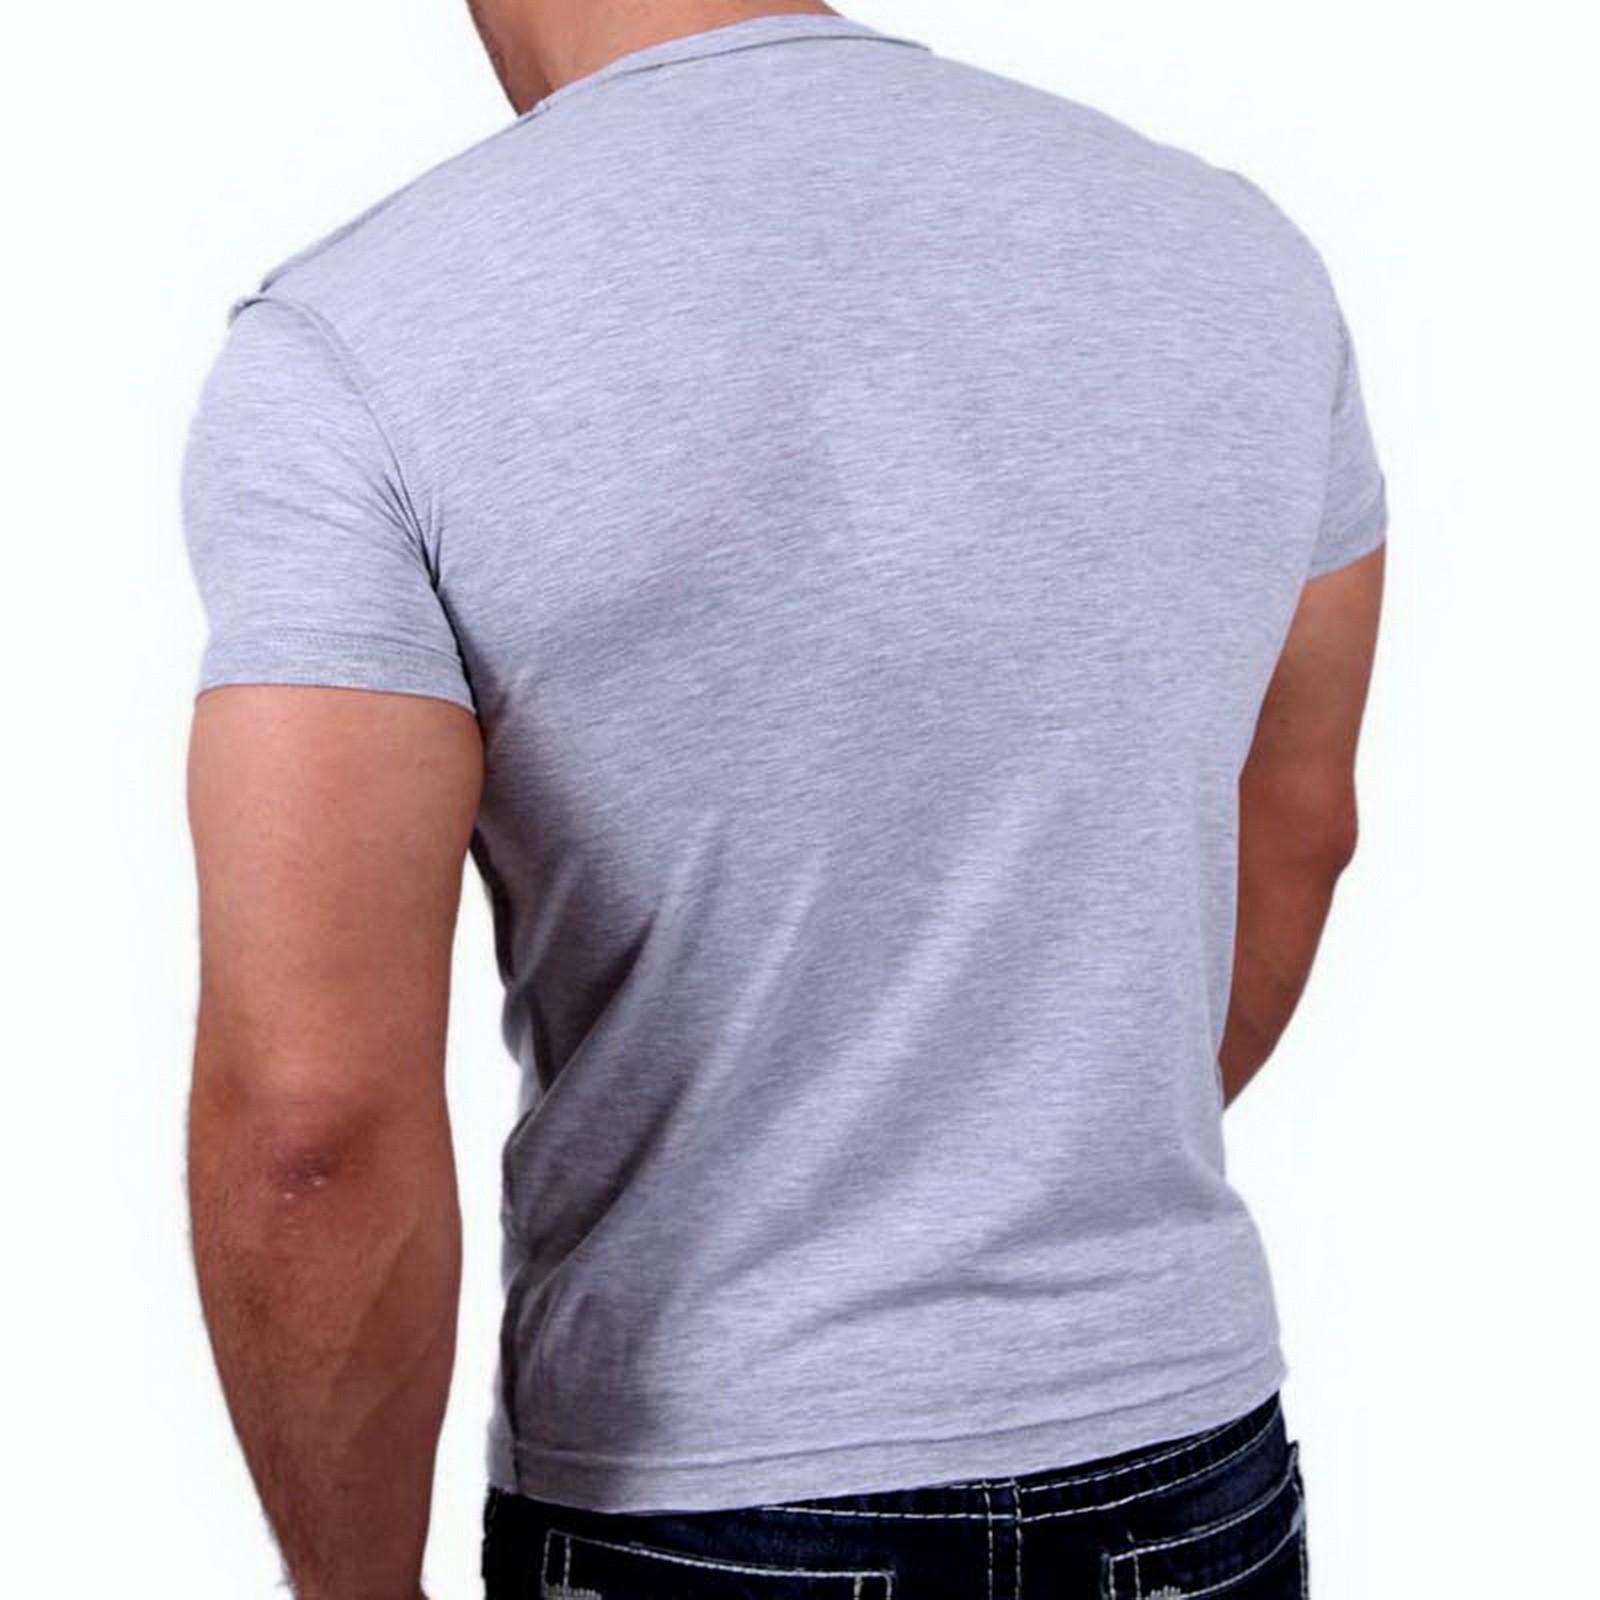 T-Shirt 4305 Strass Style Rusty Neal